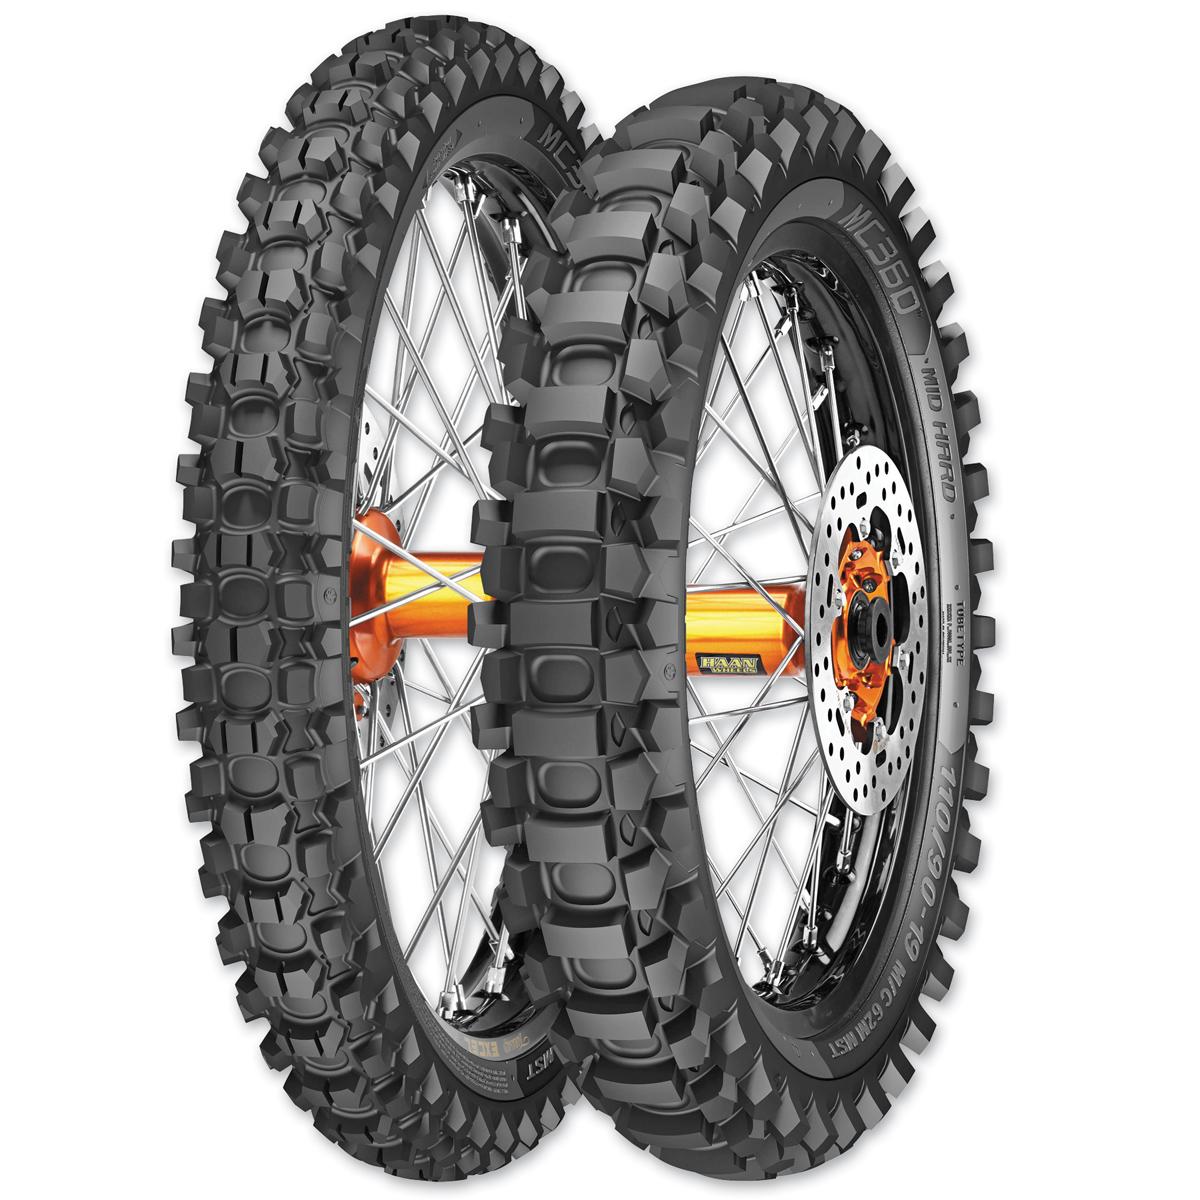 Metzeler MC 360 100/90-19 Rear Tire